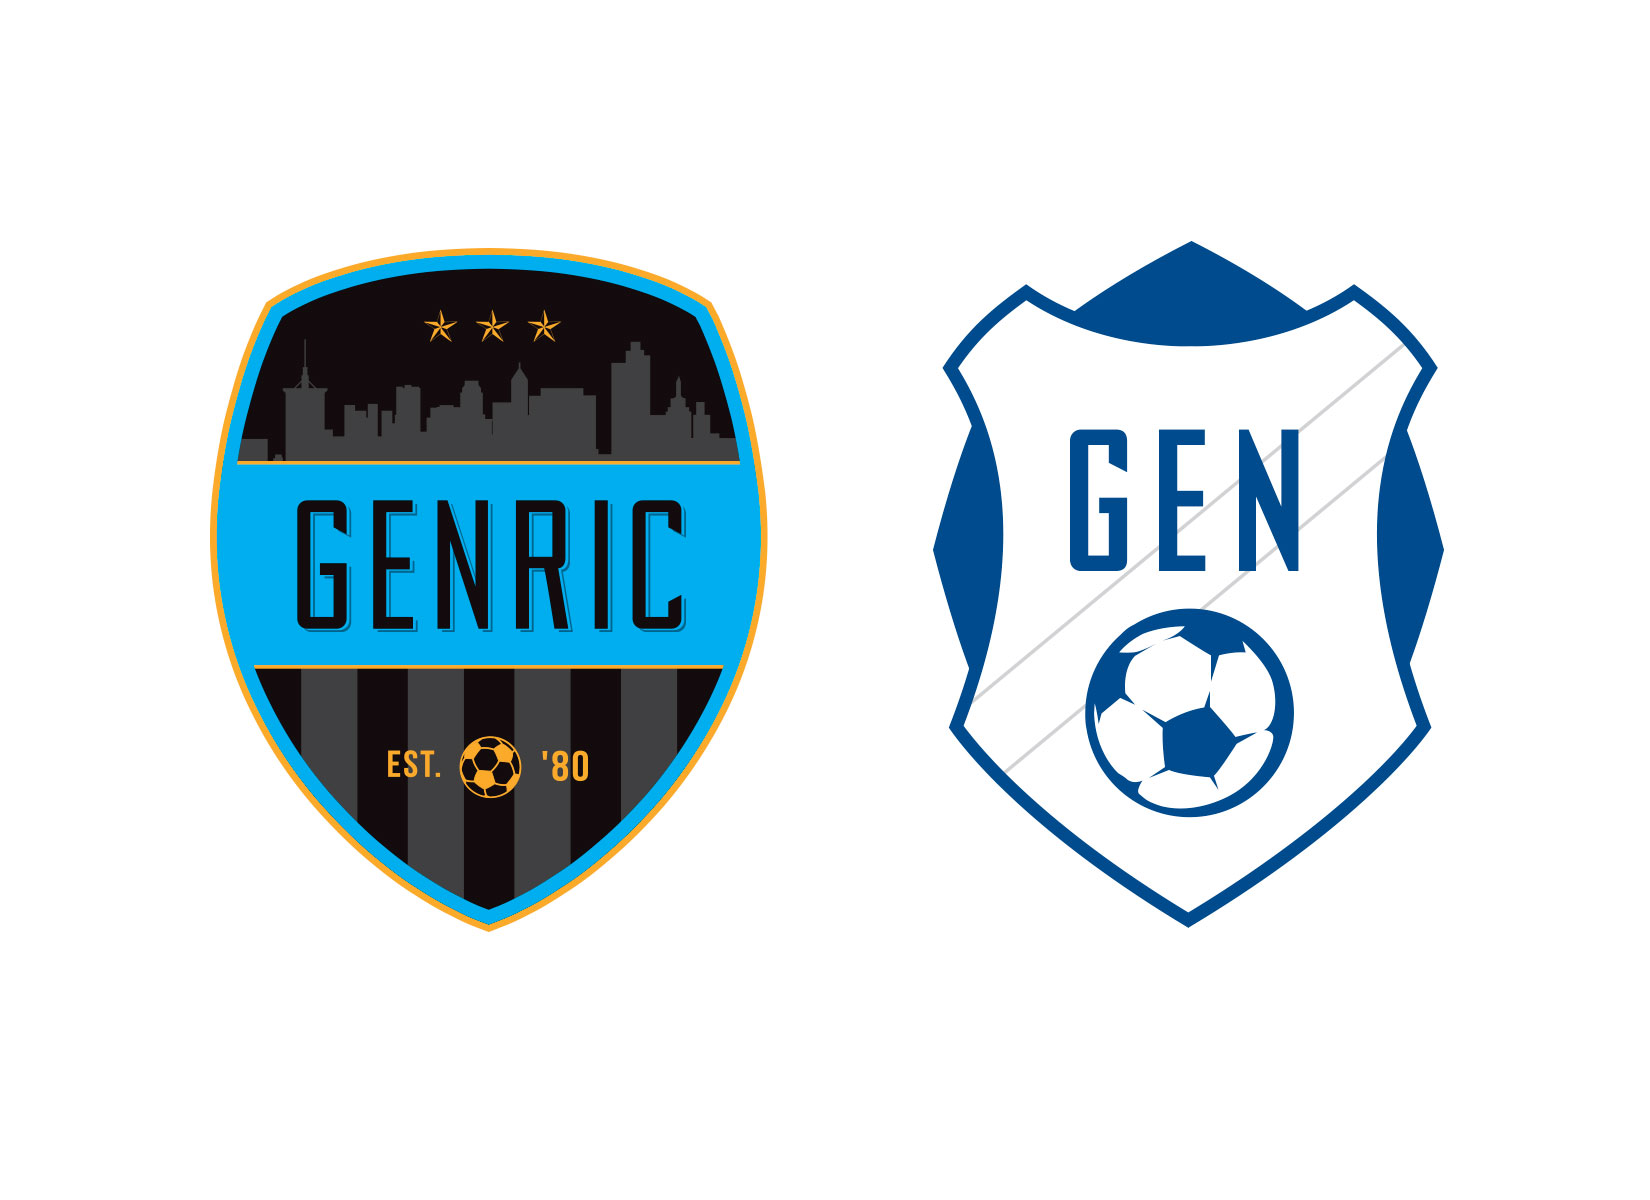 generic-soccer-crest-template-designs-by-jordan-fretz-3.jpg